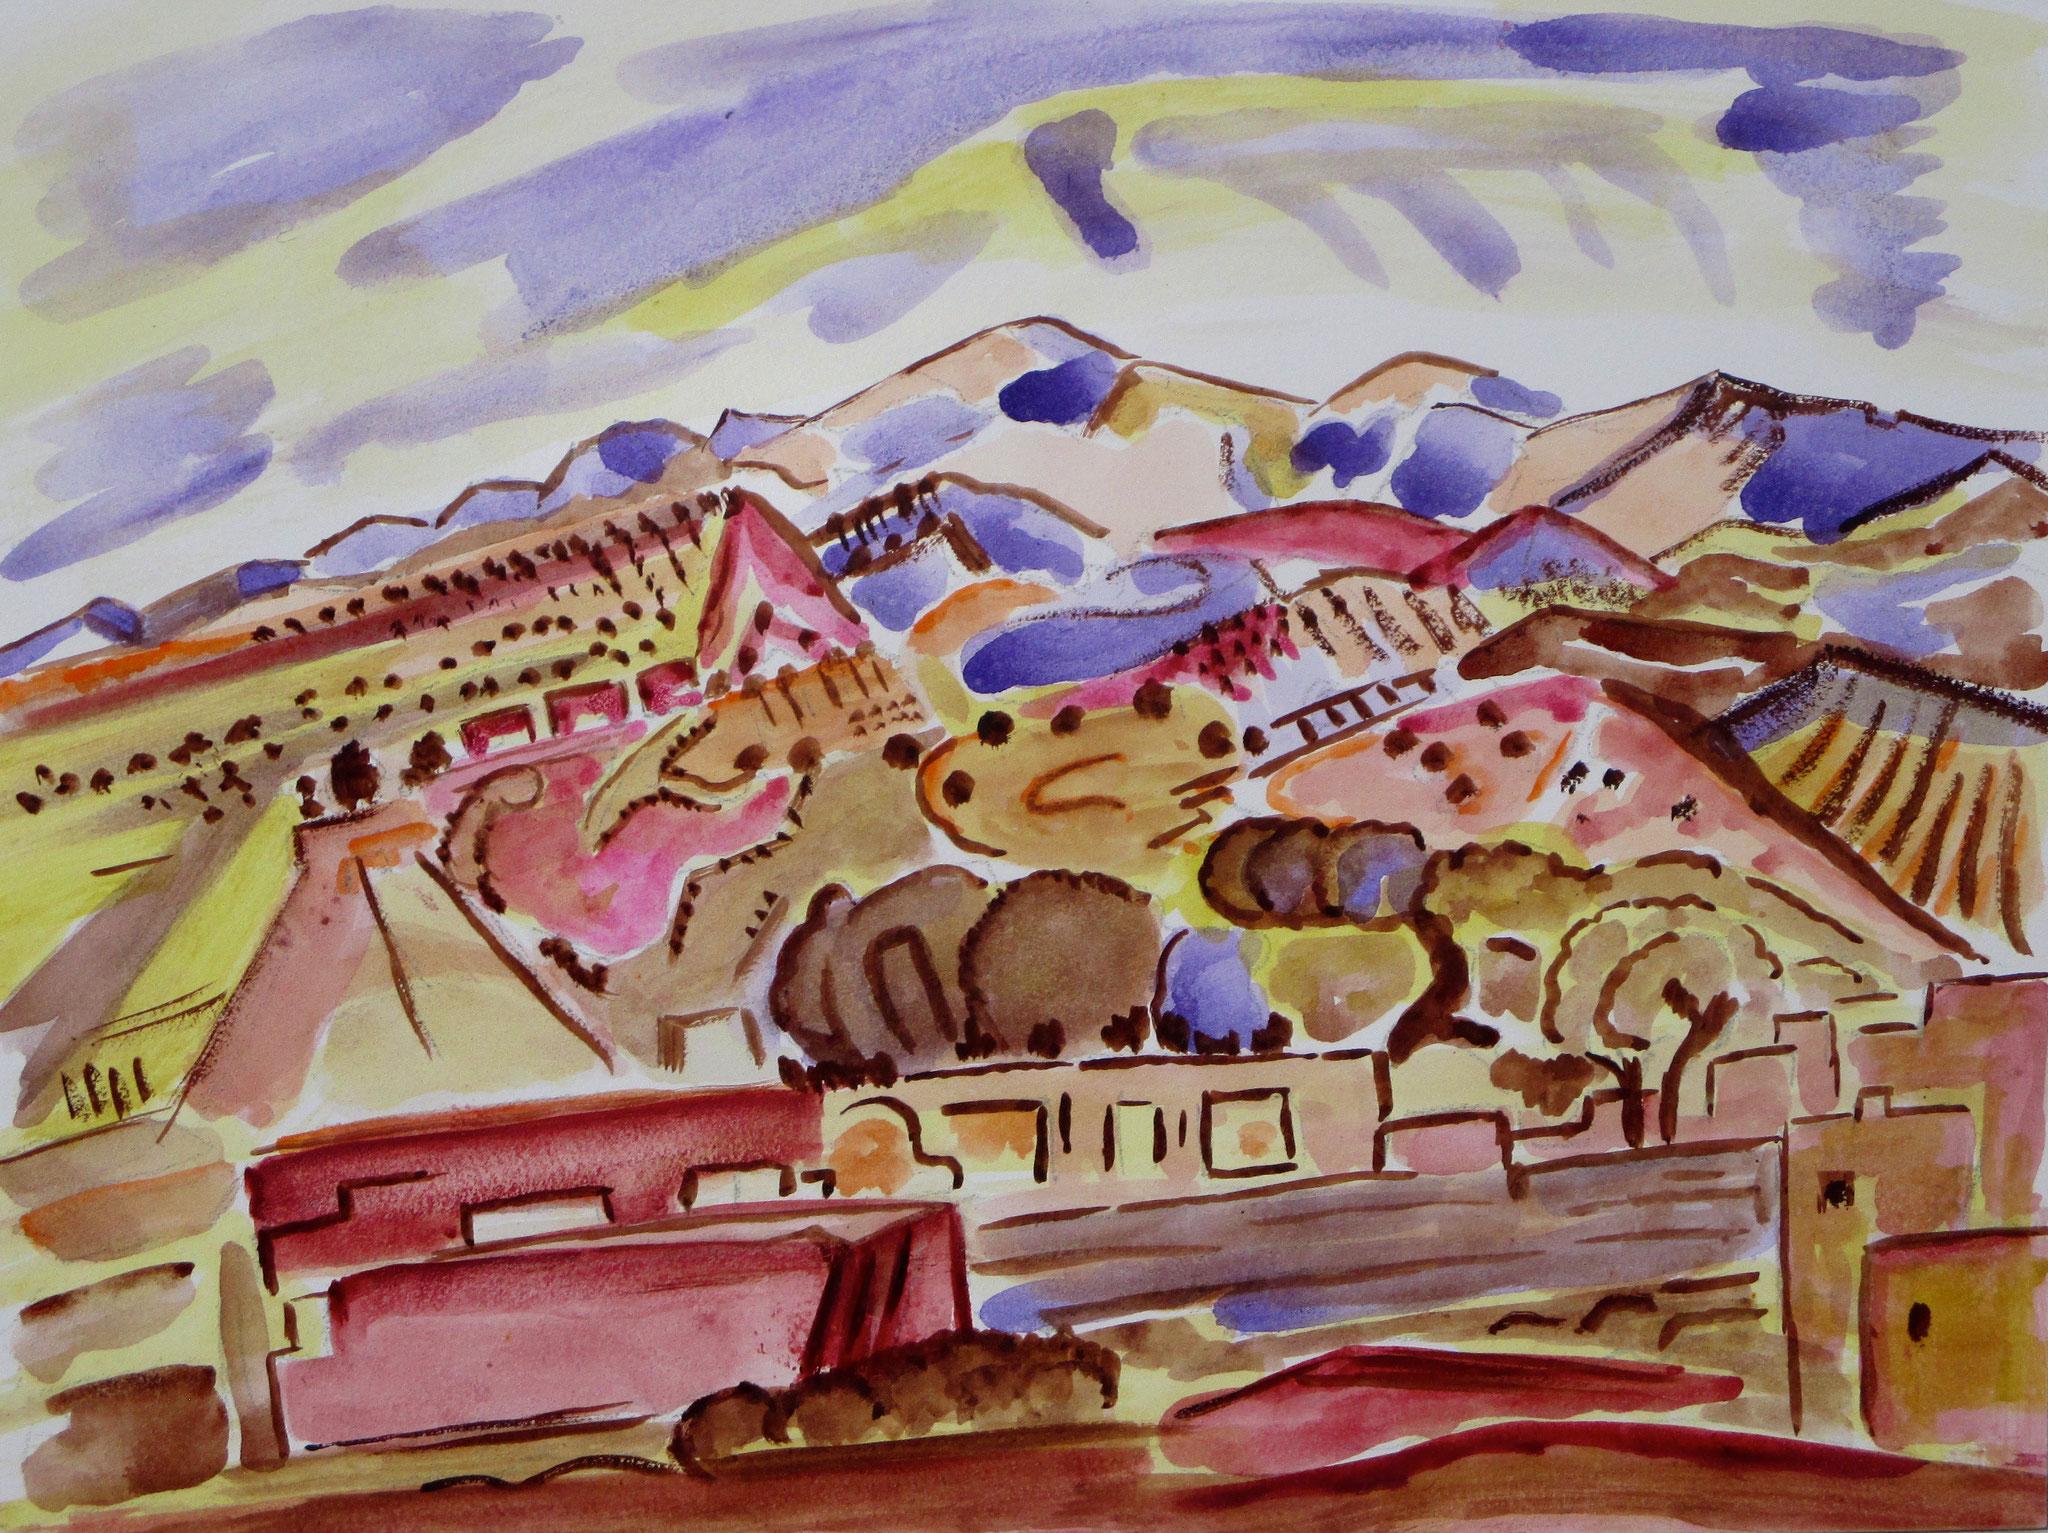 Lavender Skies, watercolor on board, 12 x 9,  SOLD